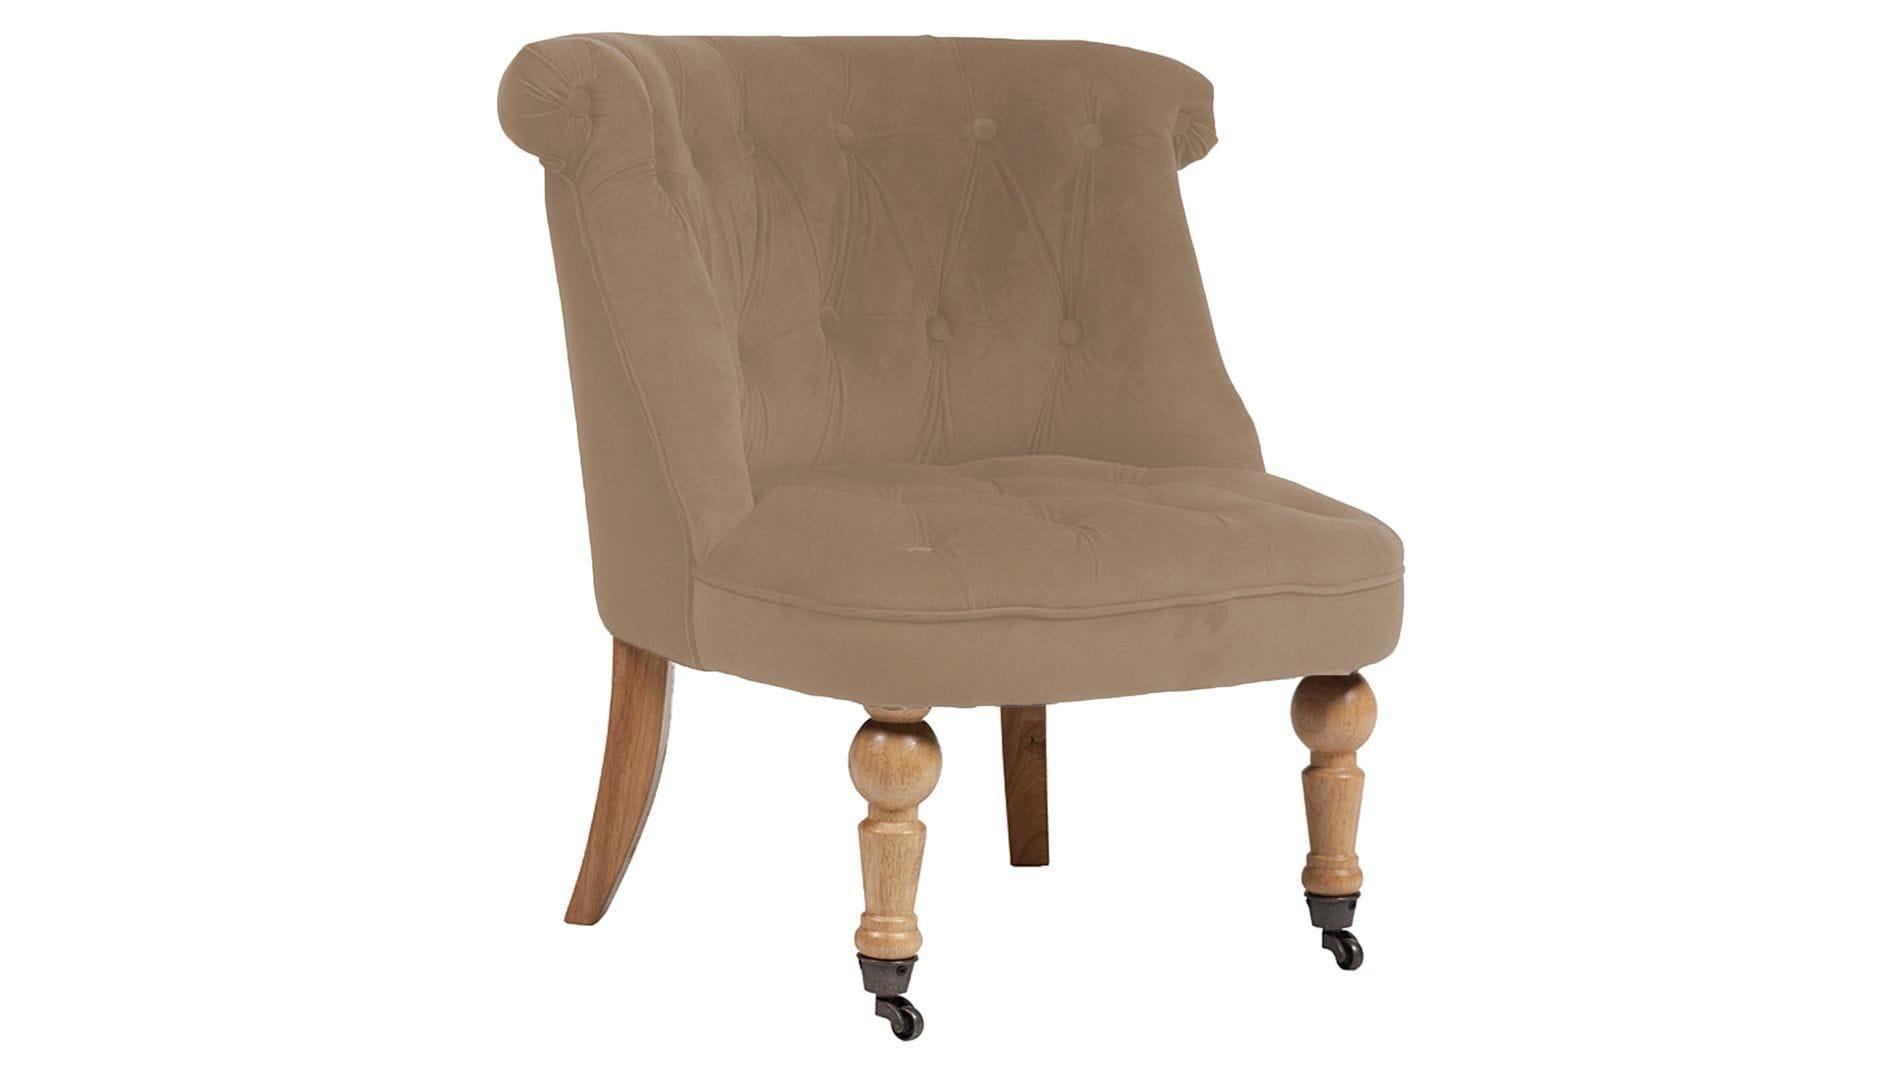 Кресло Amelie French Country Chair Светло-Коричневый Велюр М